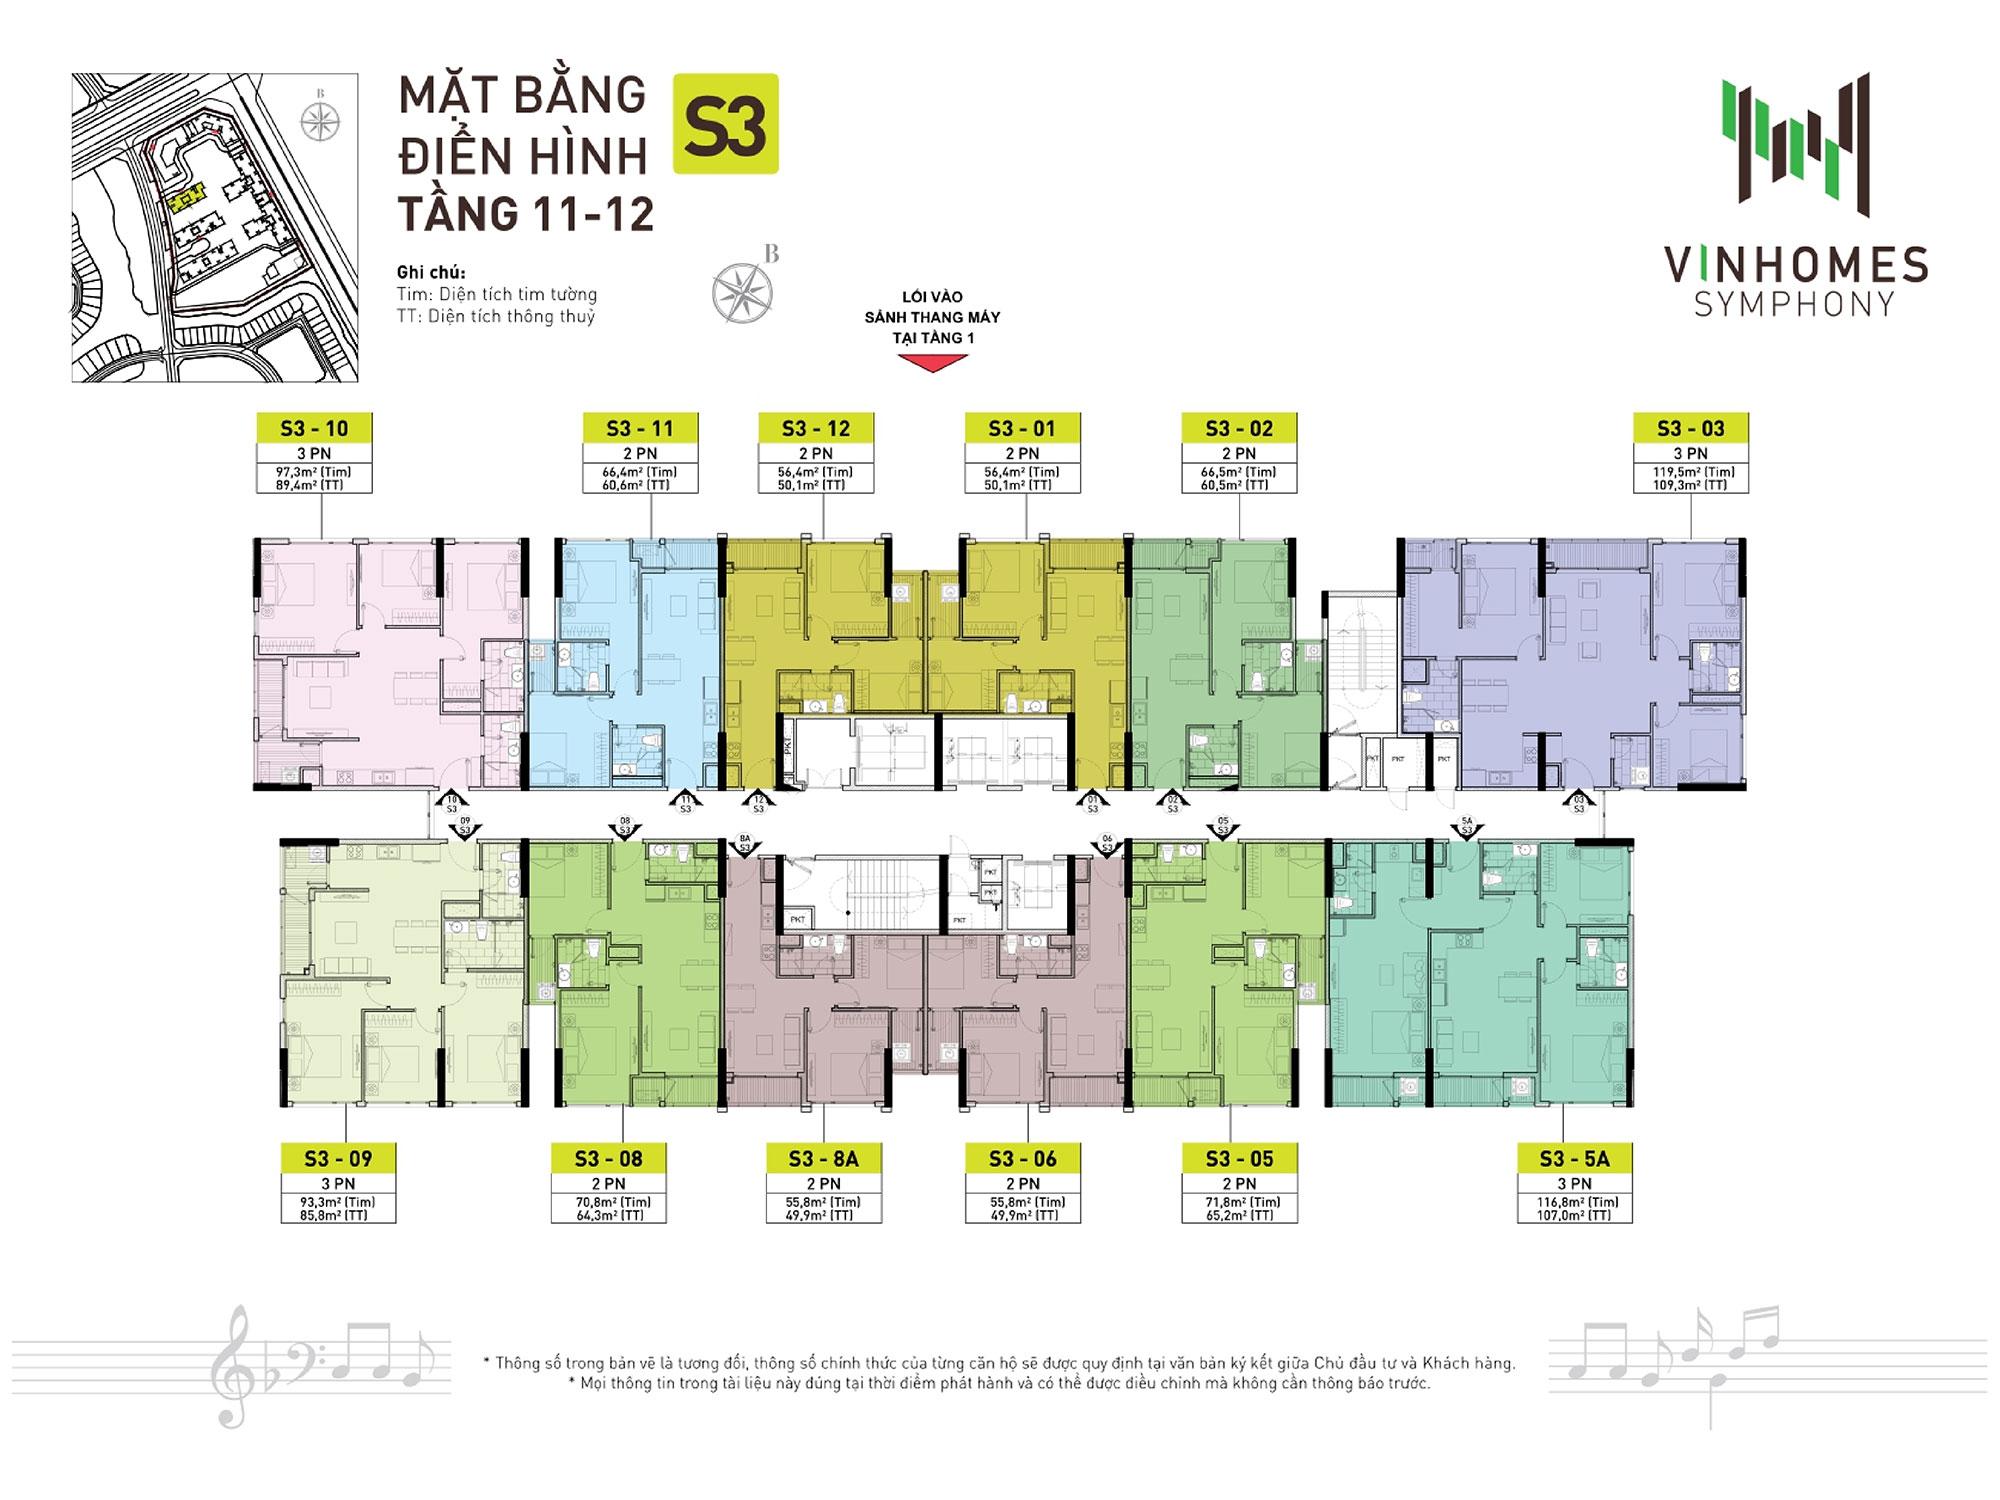 mat-bang-tang-11-12-toa-s3-vinhomes-symphony